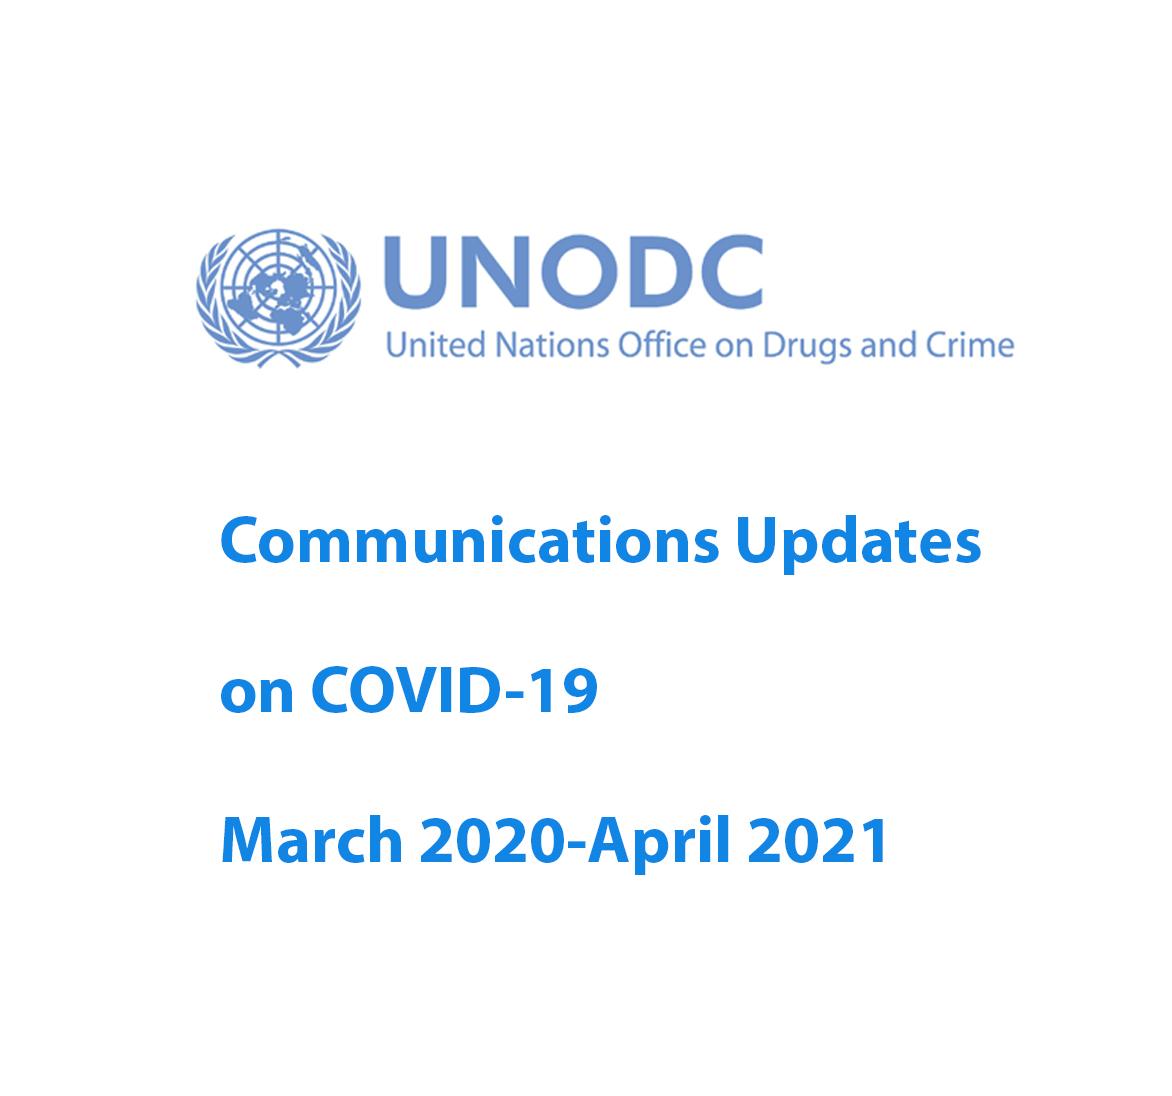 UNODC Communications Updates on COVID-19